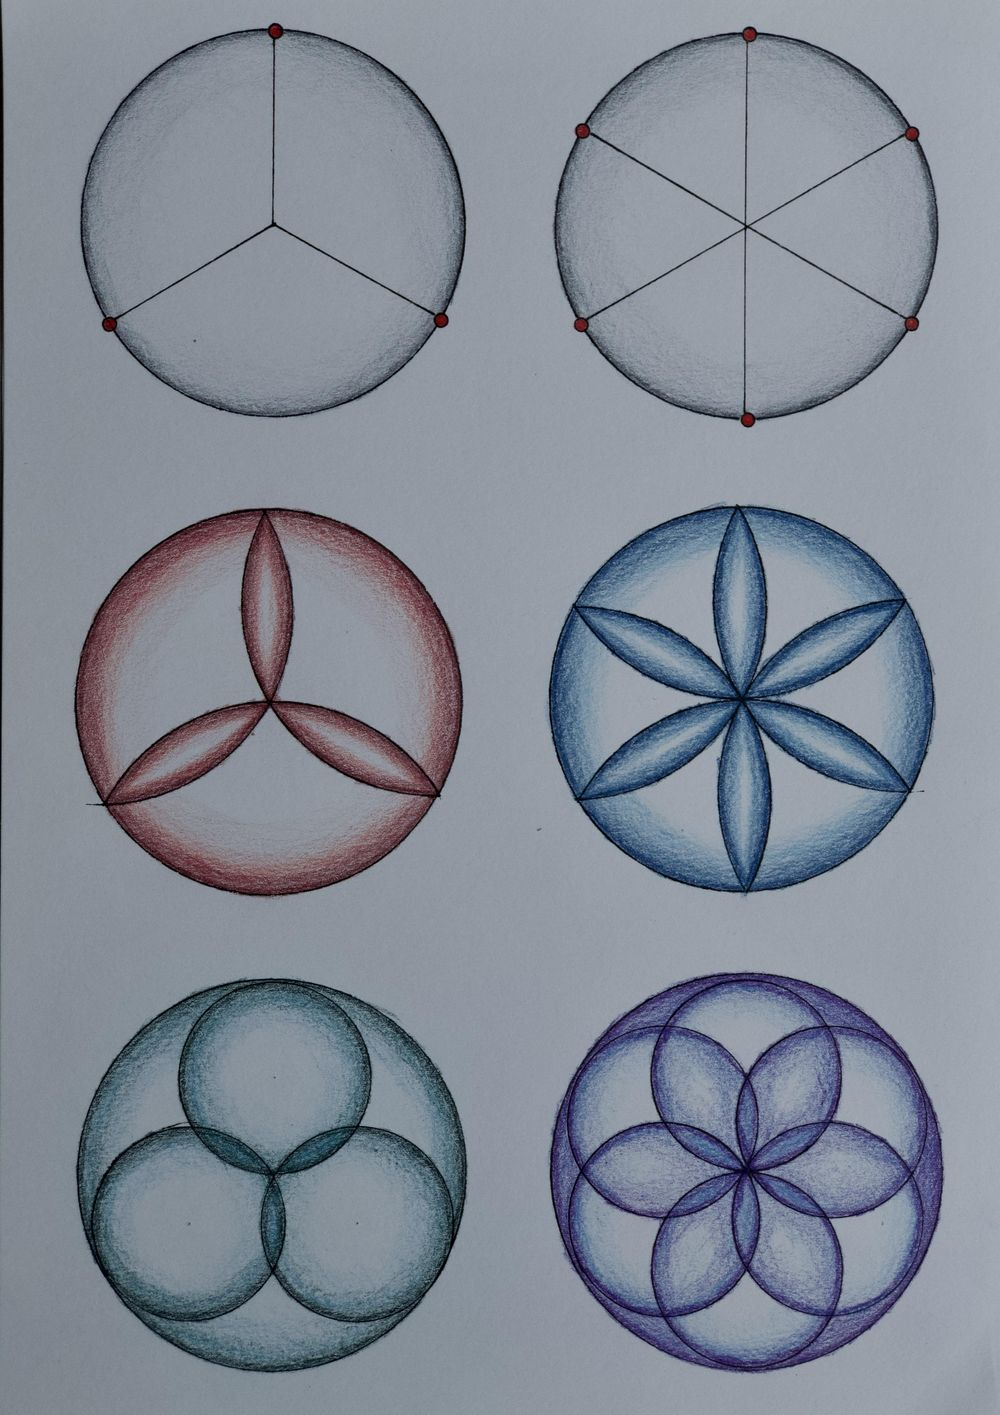 Geometric Design - image 1 - student project